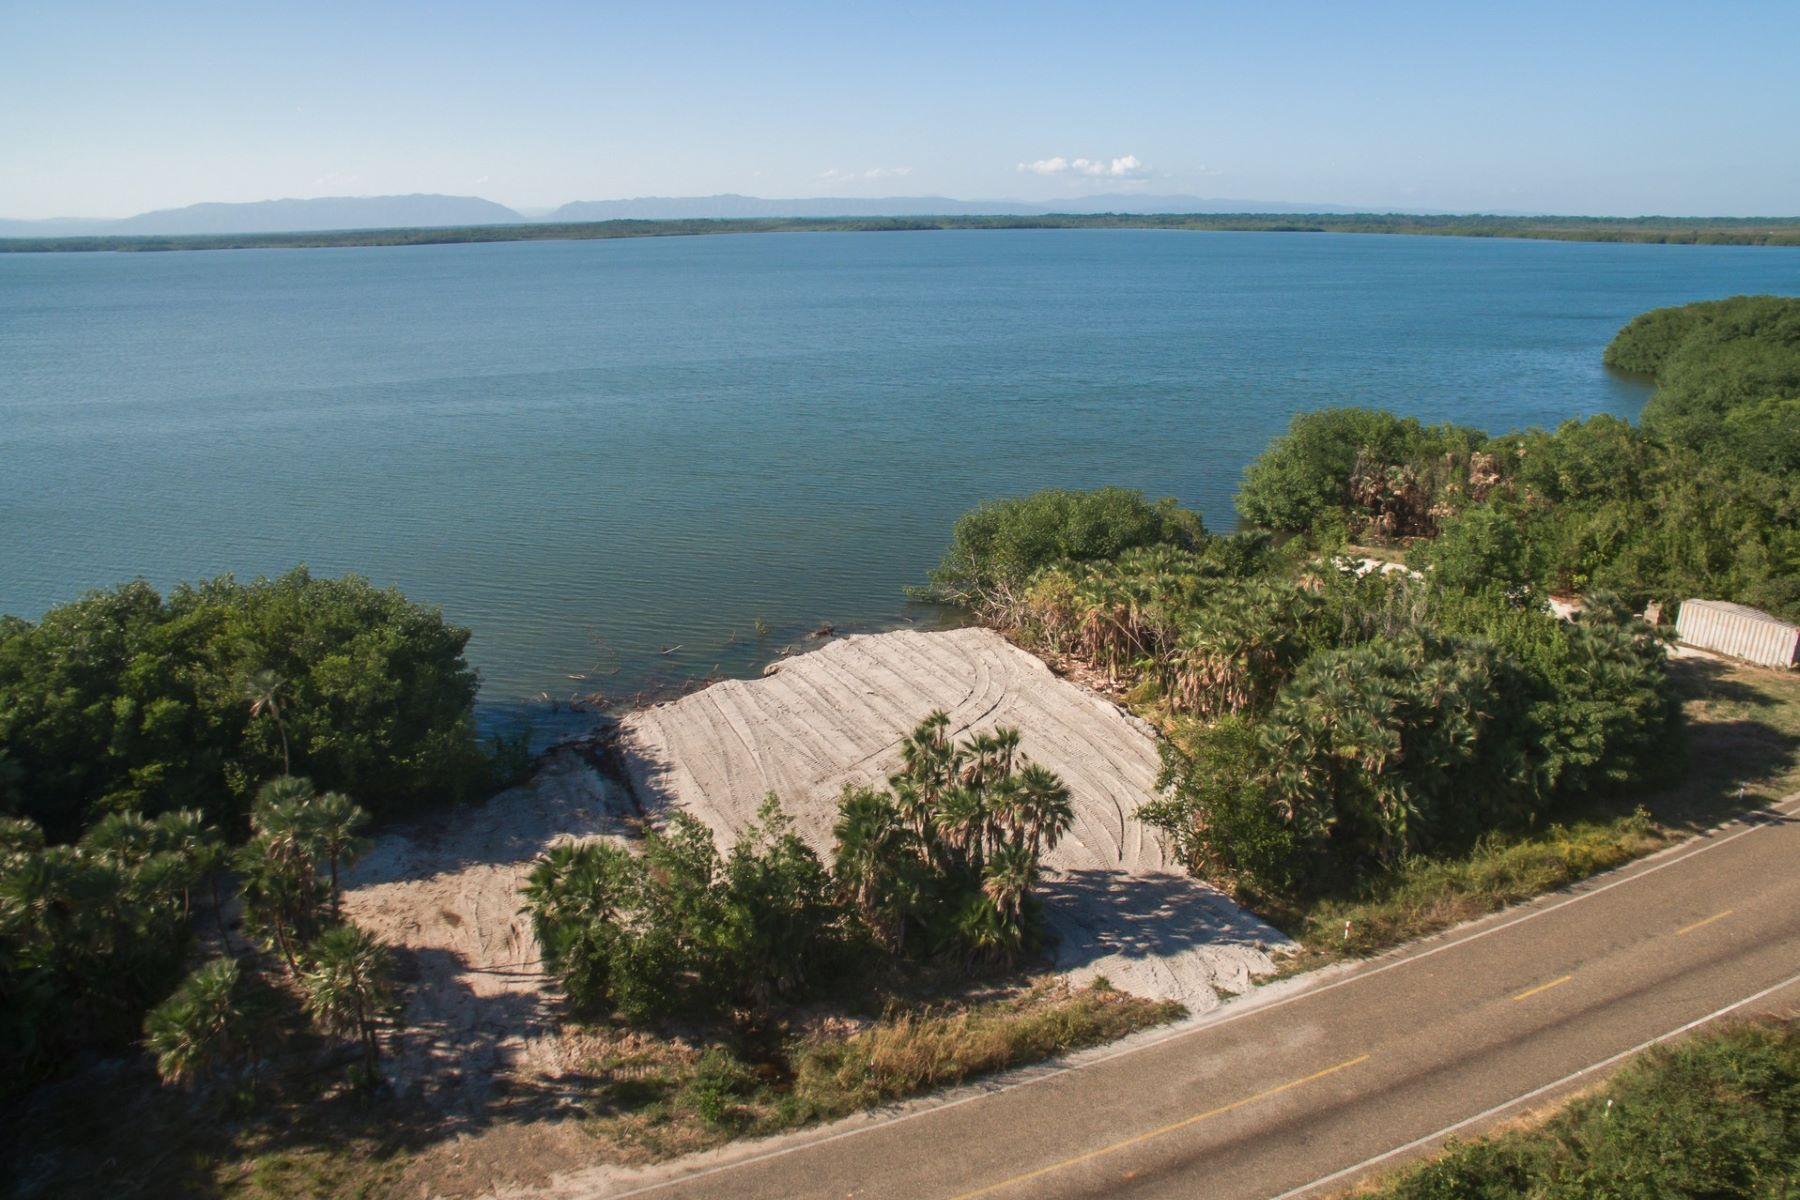 Land for Sale at Plantation Area Residential Lot Placencia, Stann Creek, Belize